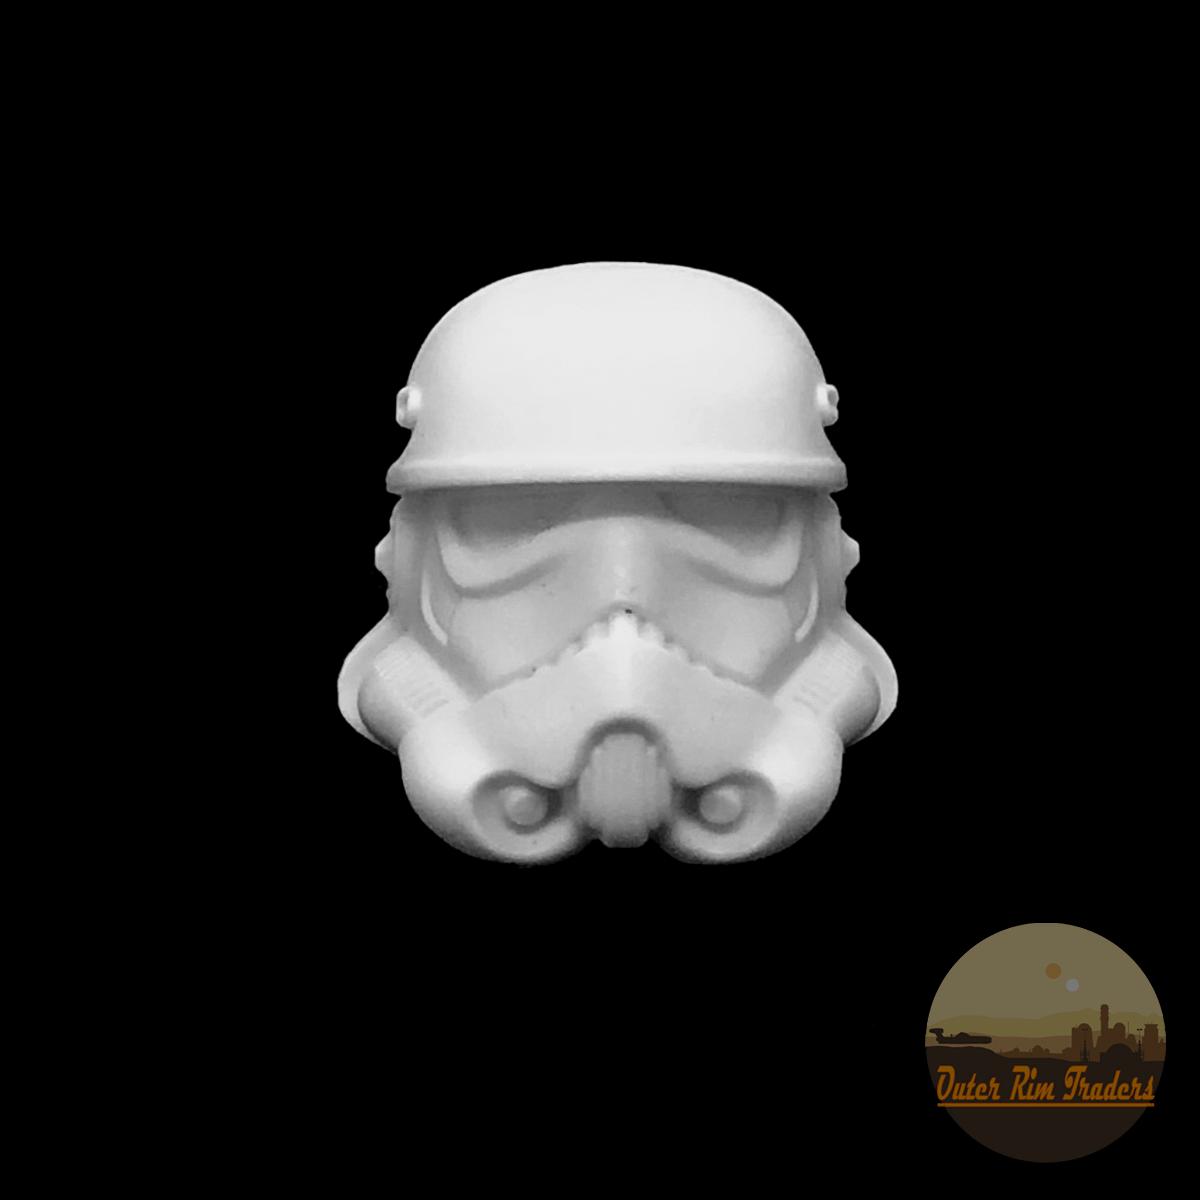 Image of OT Heavy Trooper